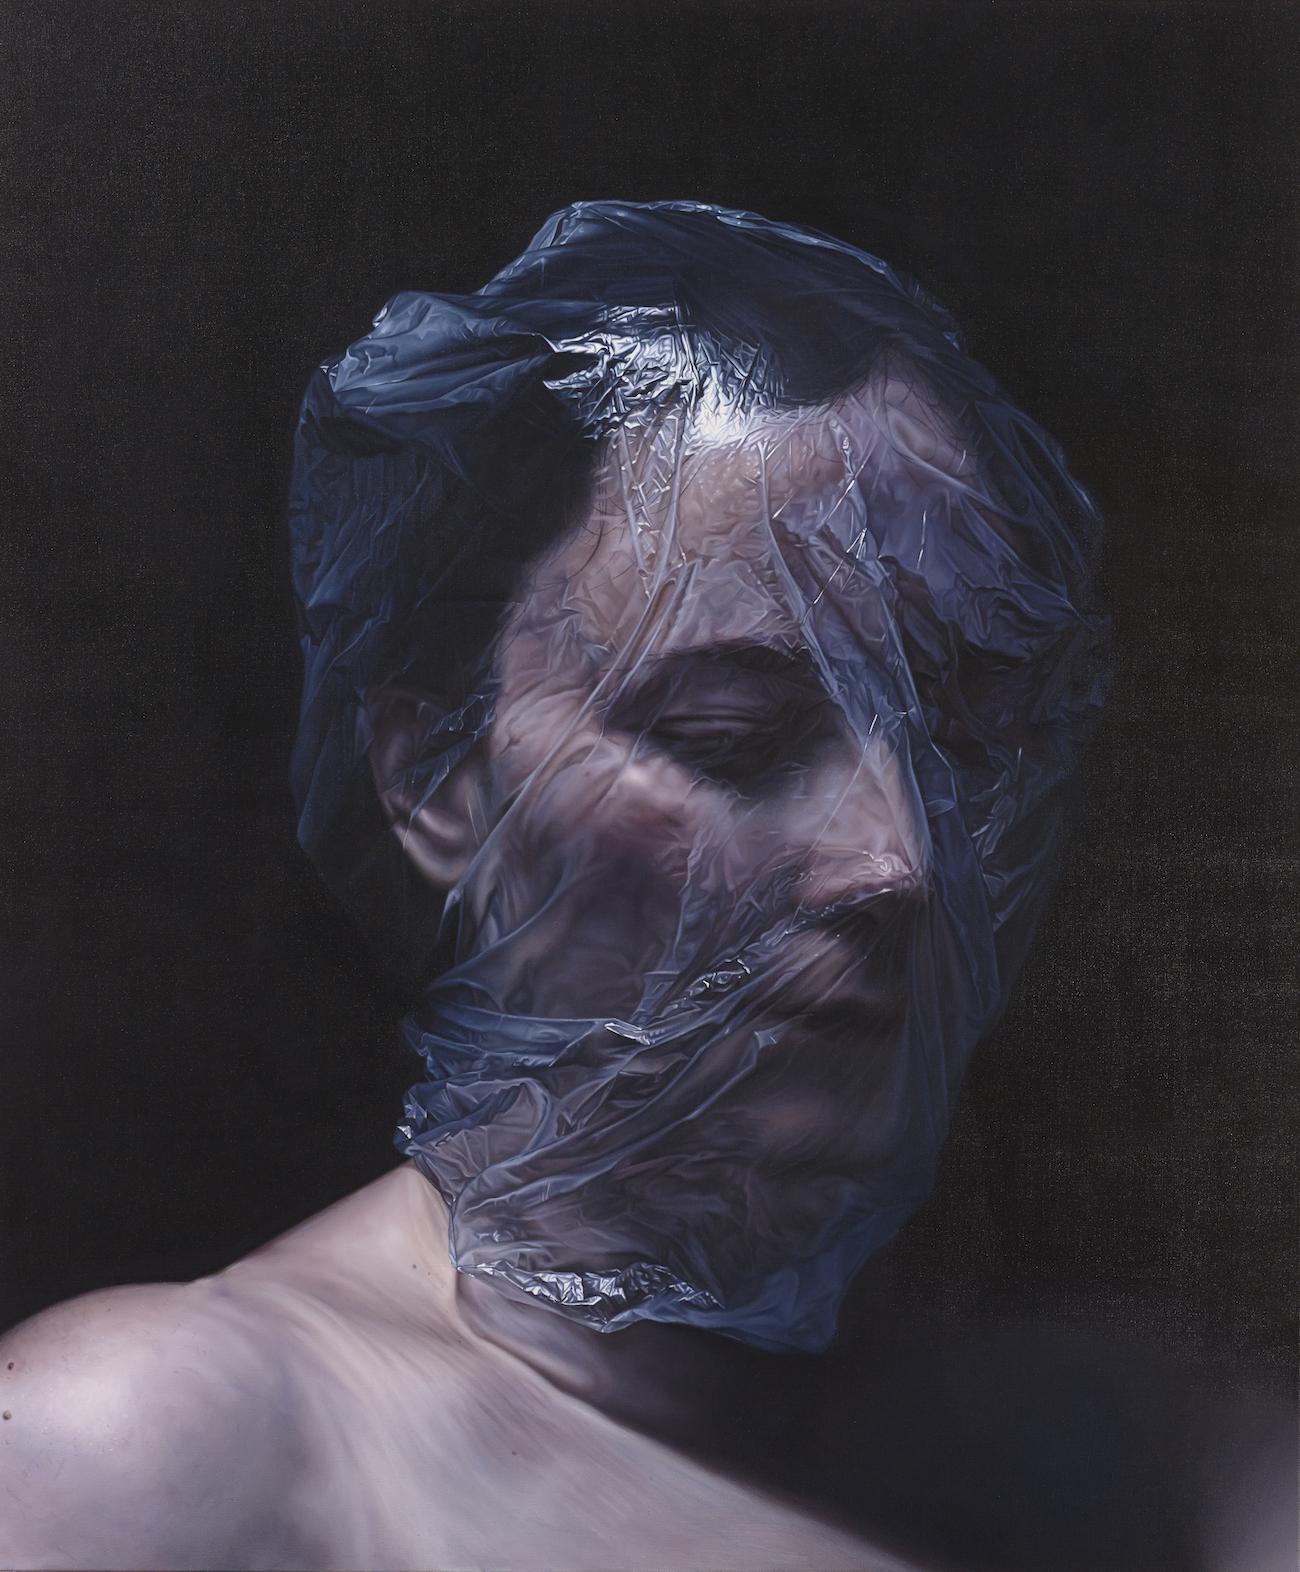 Vehosalo Picture of Dorian Grey 2013